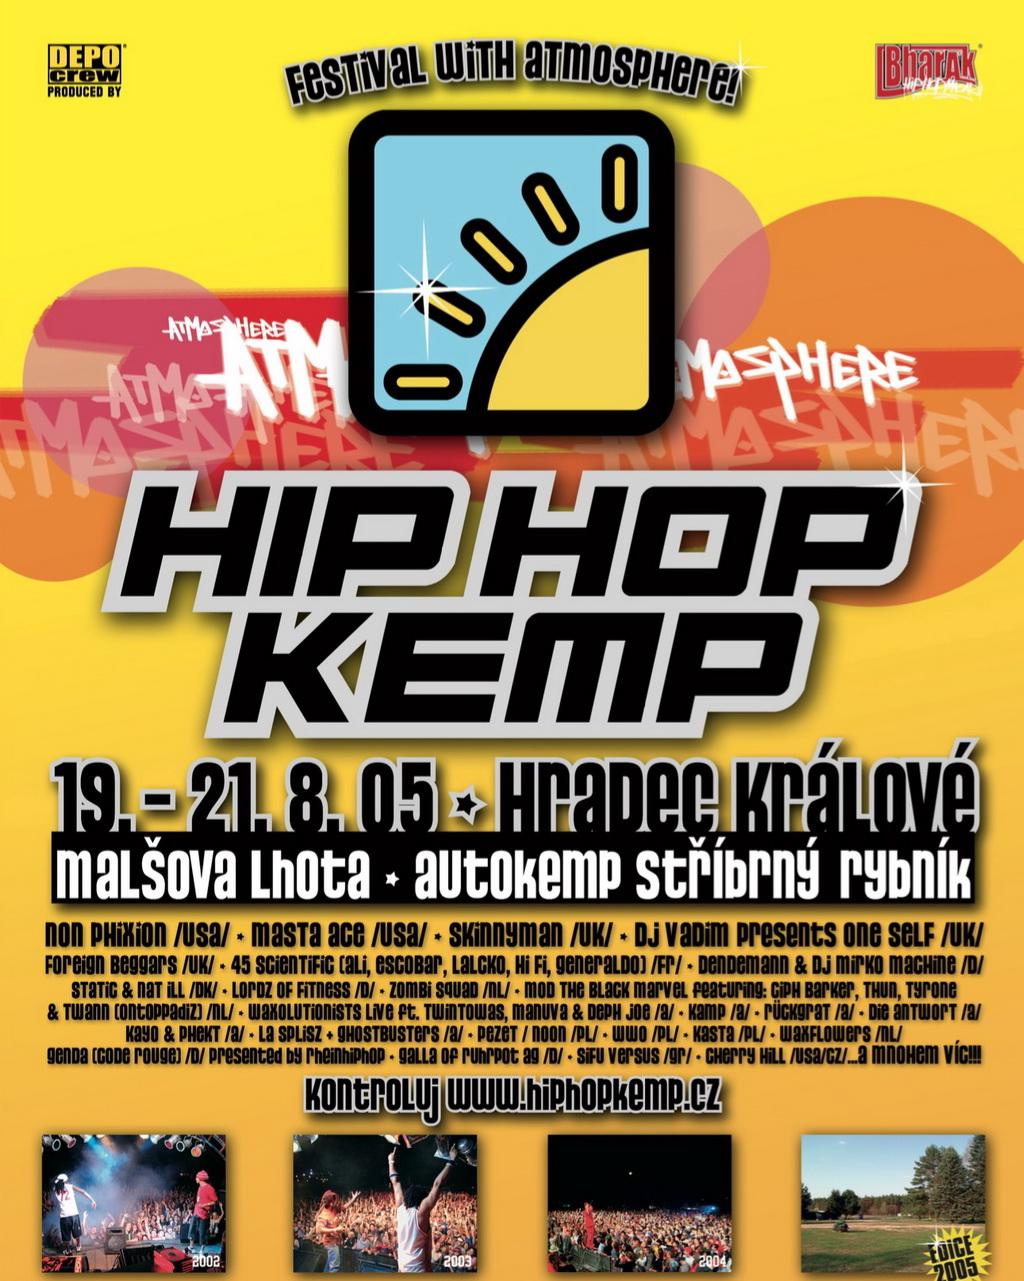 Hip Hop Kemp 2005